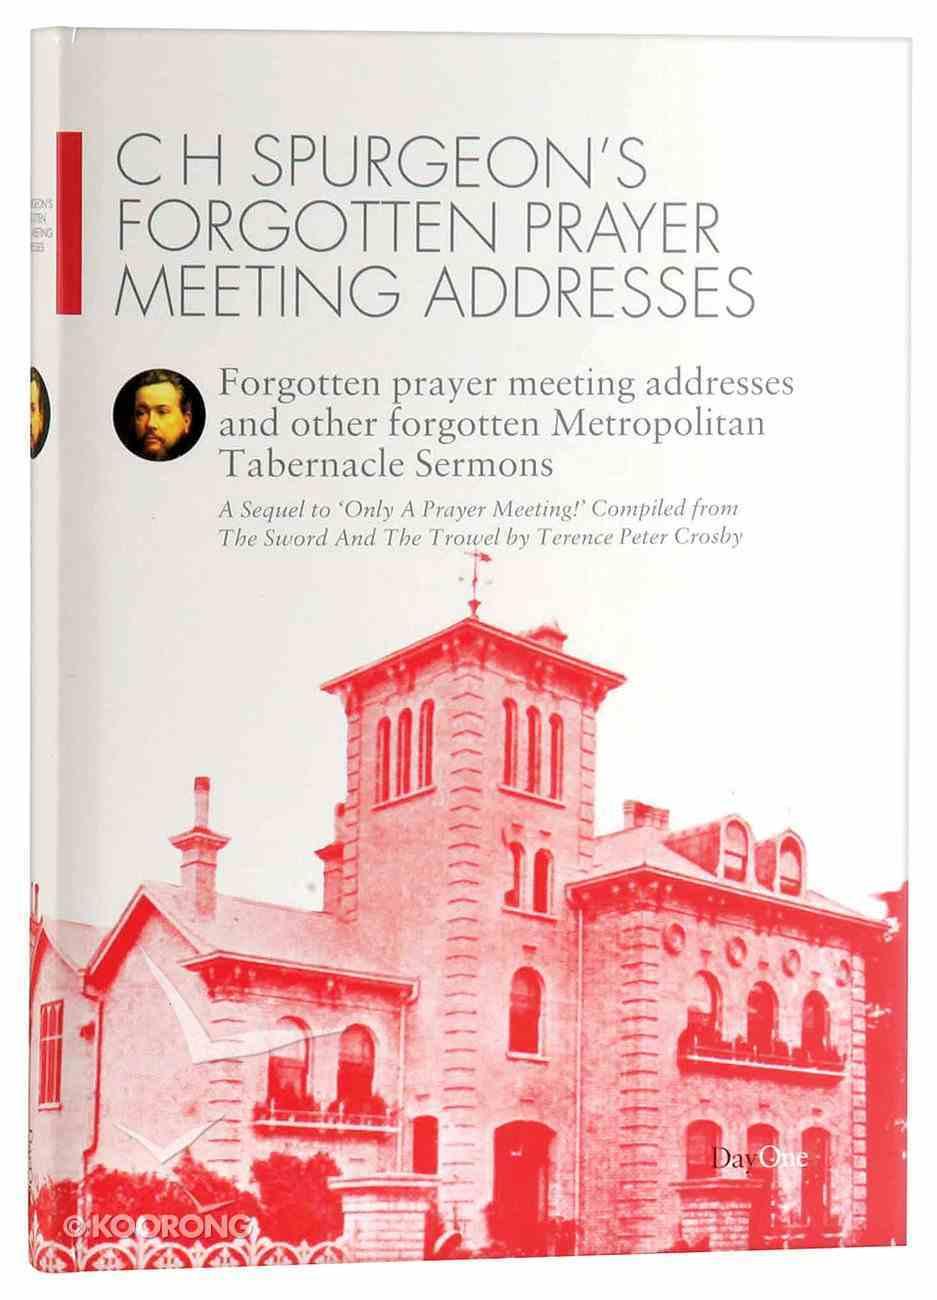 C H Spurgeon's Forgotten Prayer Meeting Addresses (Volume 1) (Spurgeon Forgotten Treasures Series) Hardback